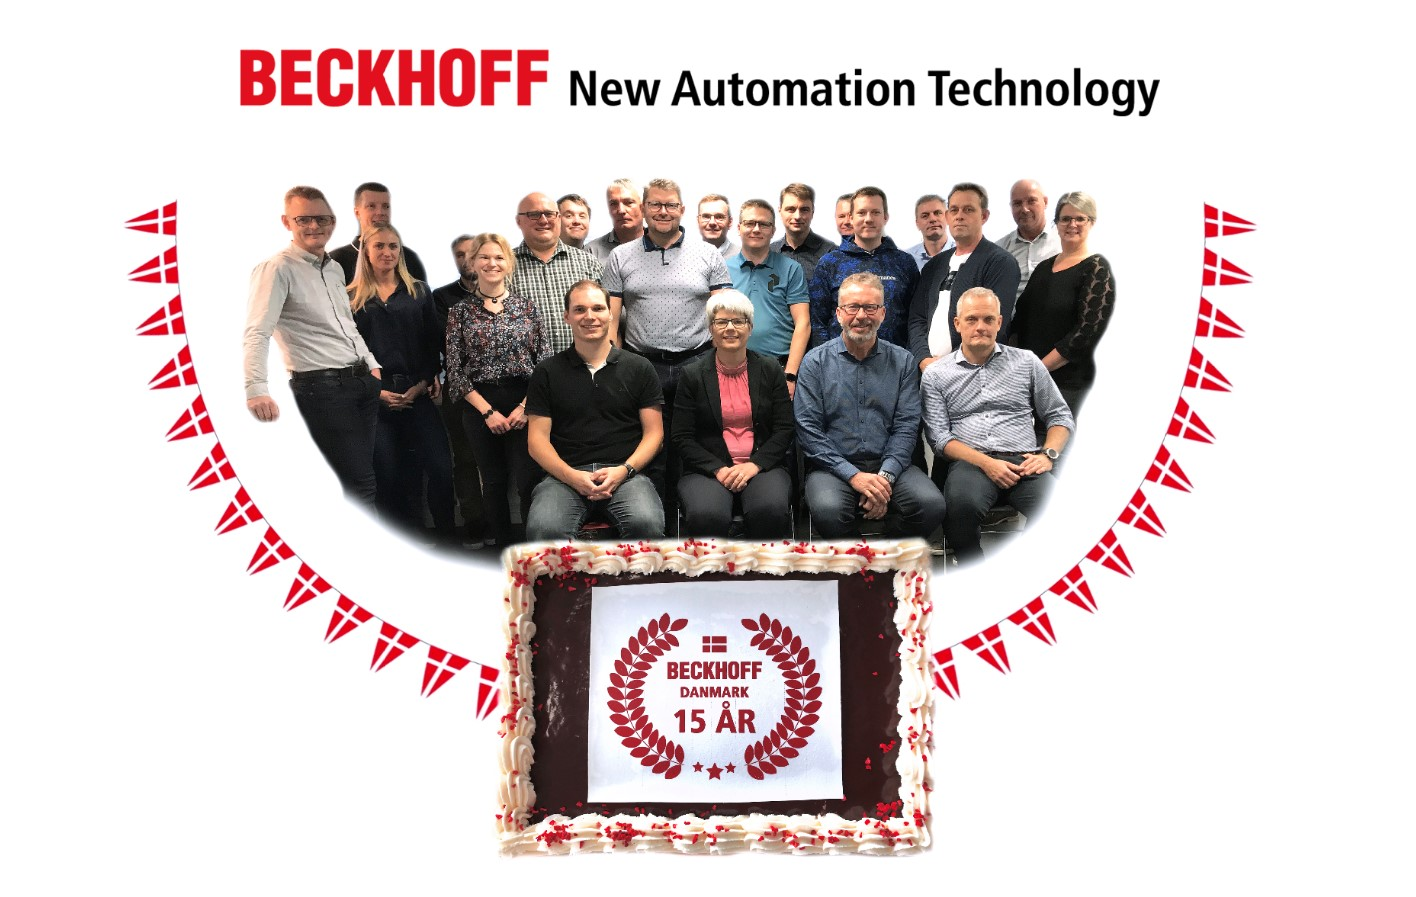 Beckhoff Danmark - 15 års jubilæum